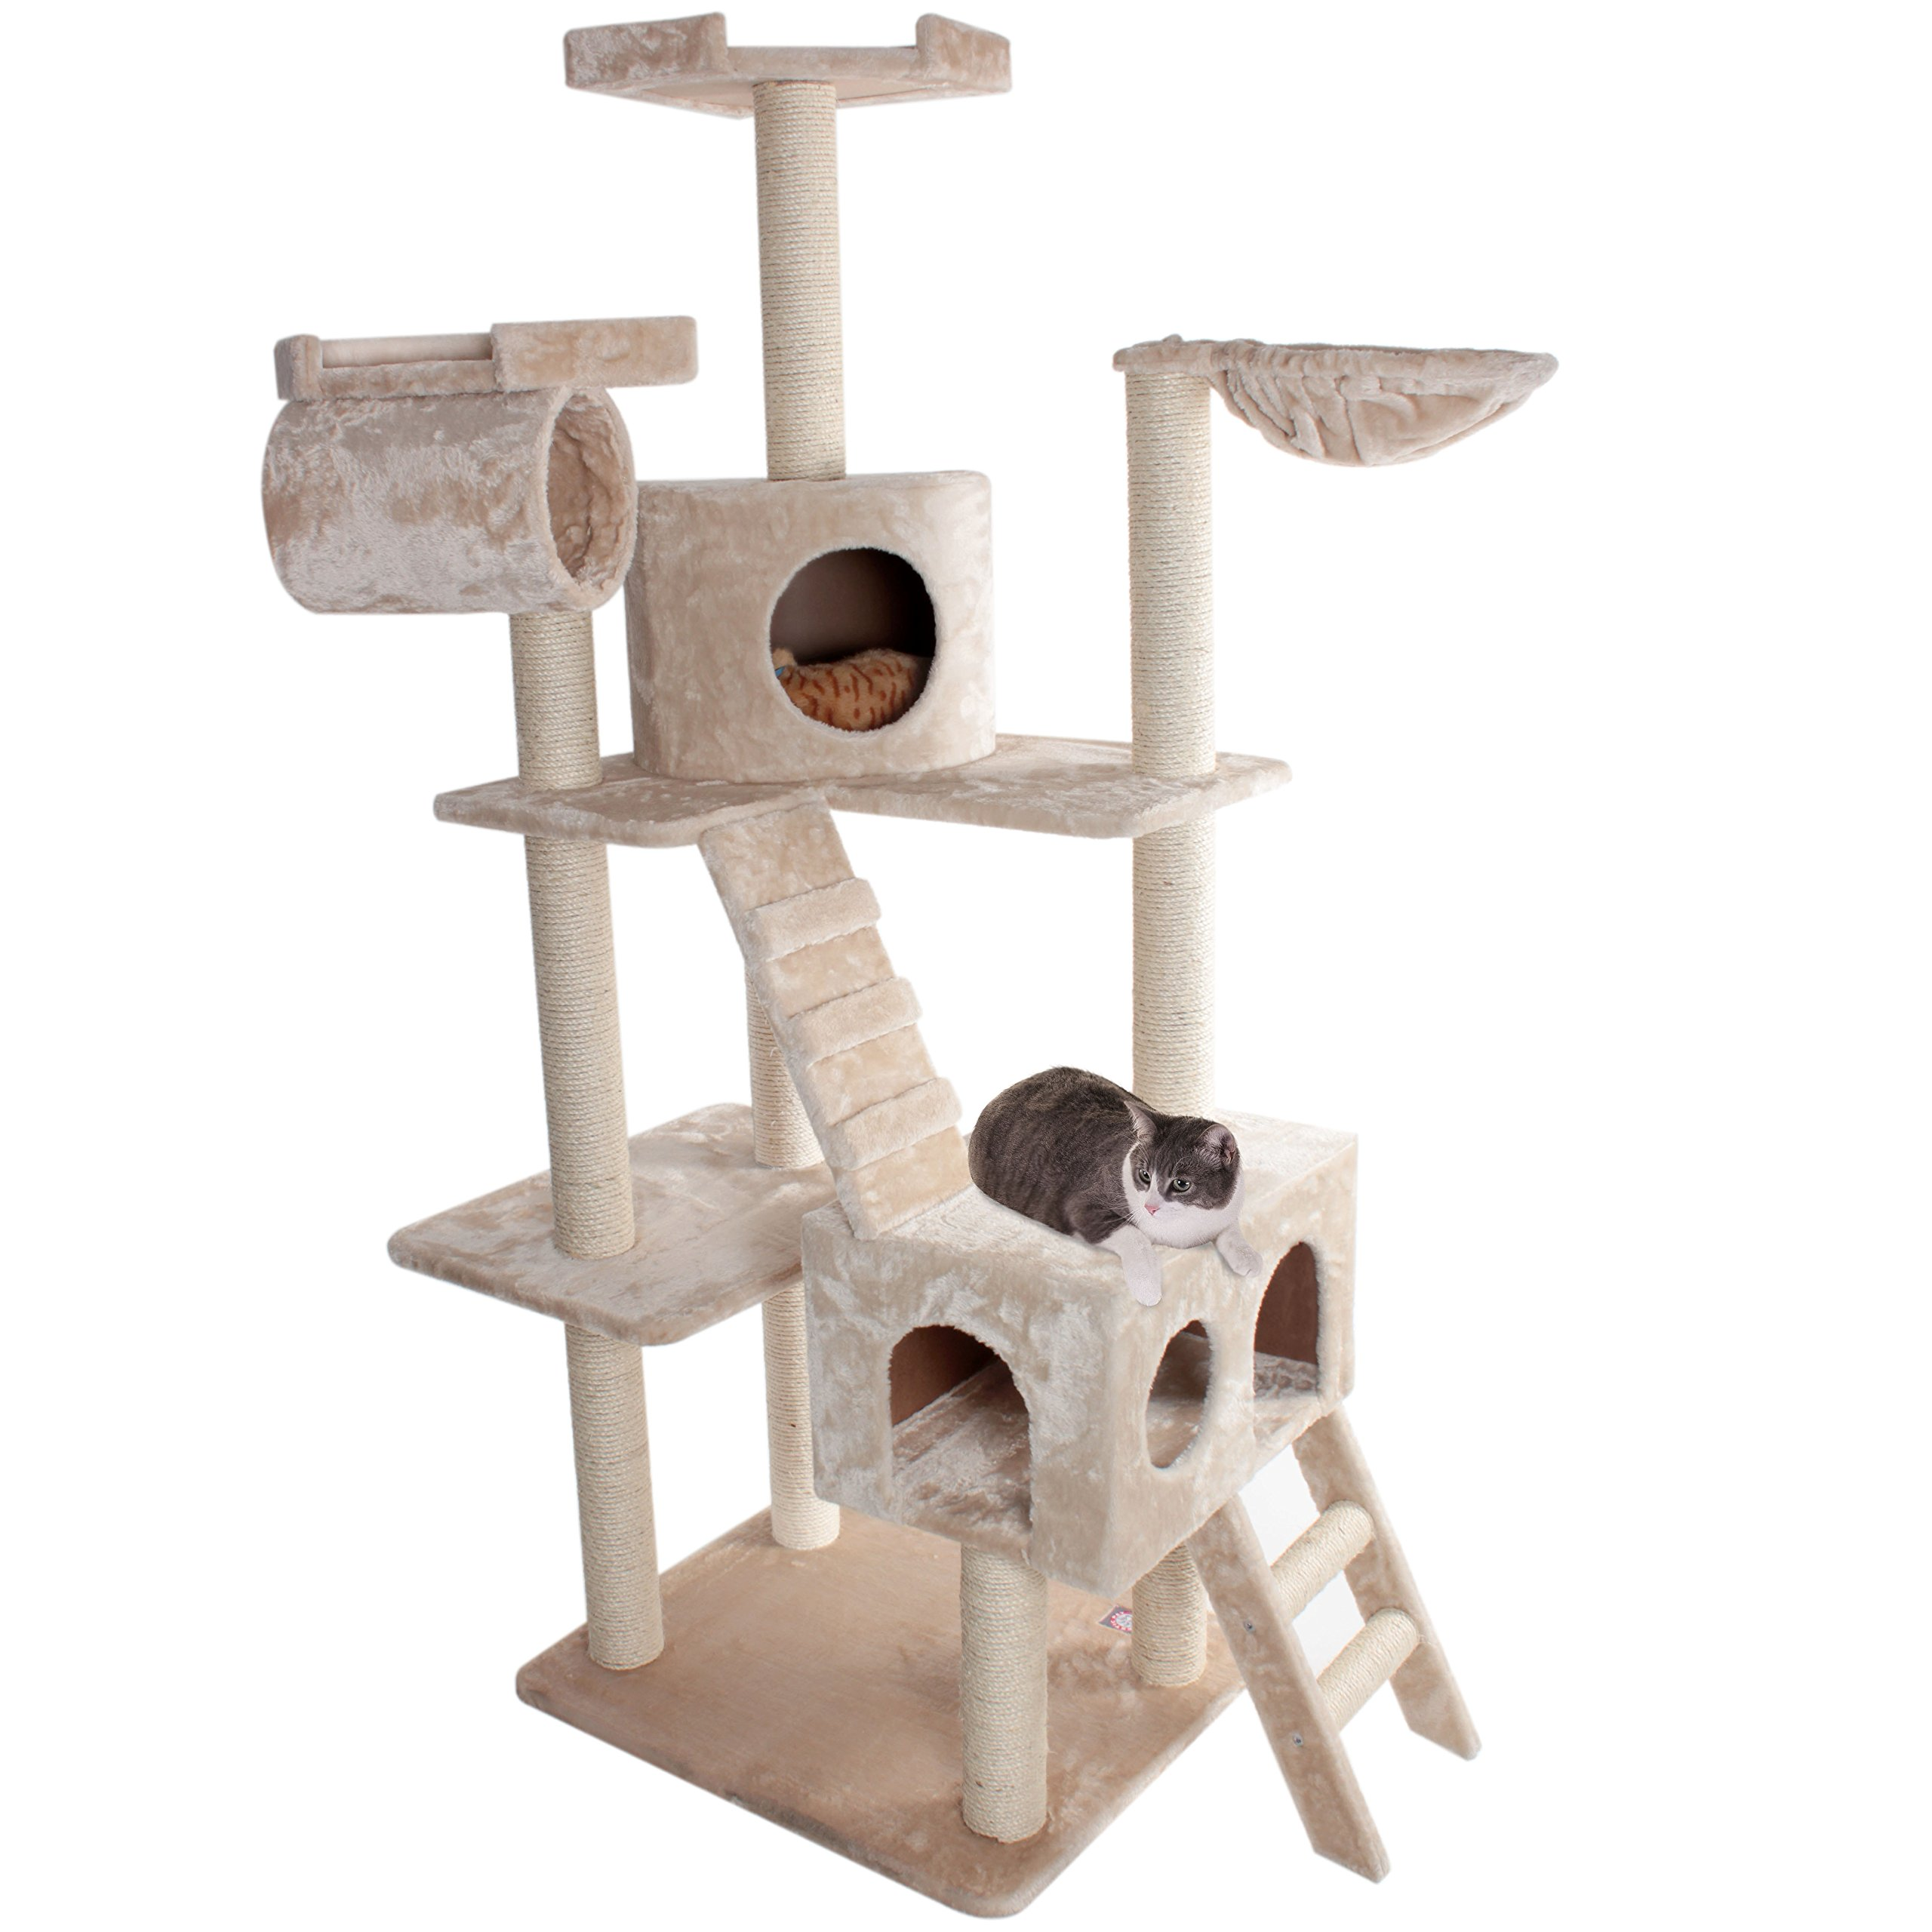 Majestic Pet Products 73 inch Beige Casita Cat Furniture Condo House Scratcher Multi Level Pet Activity Tree